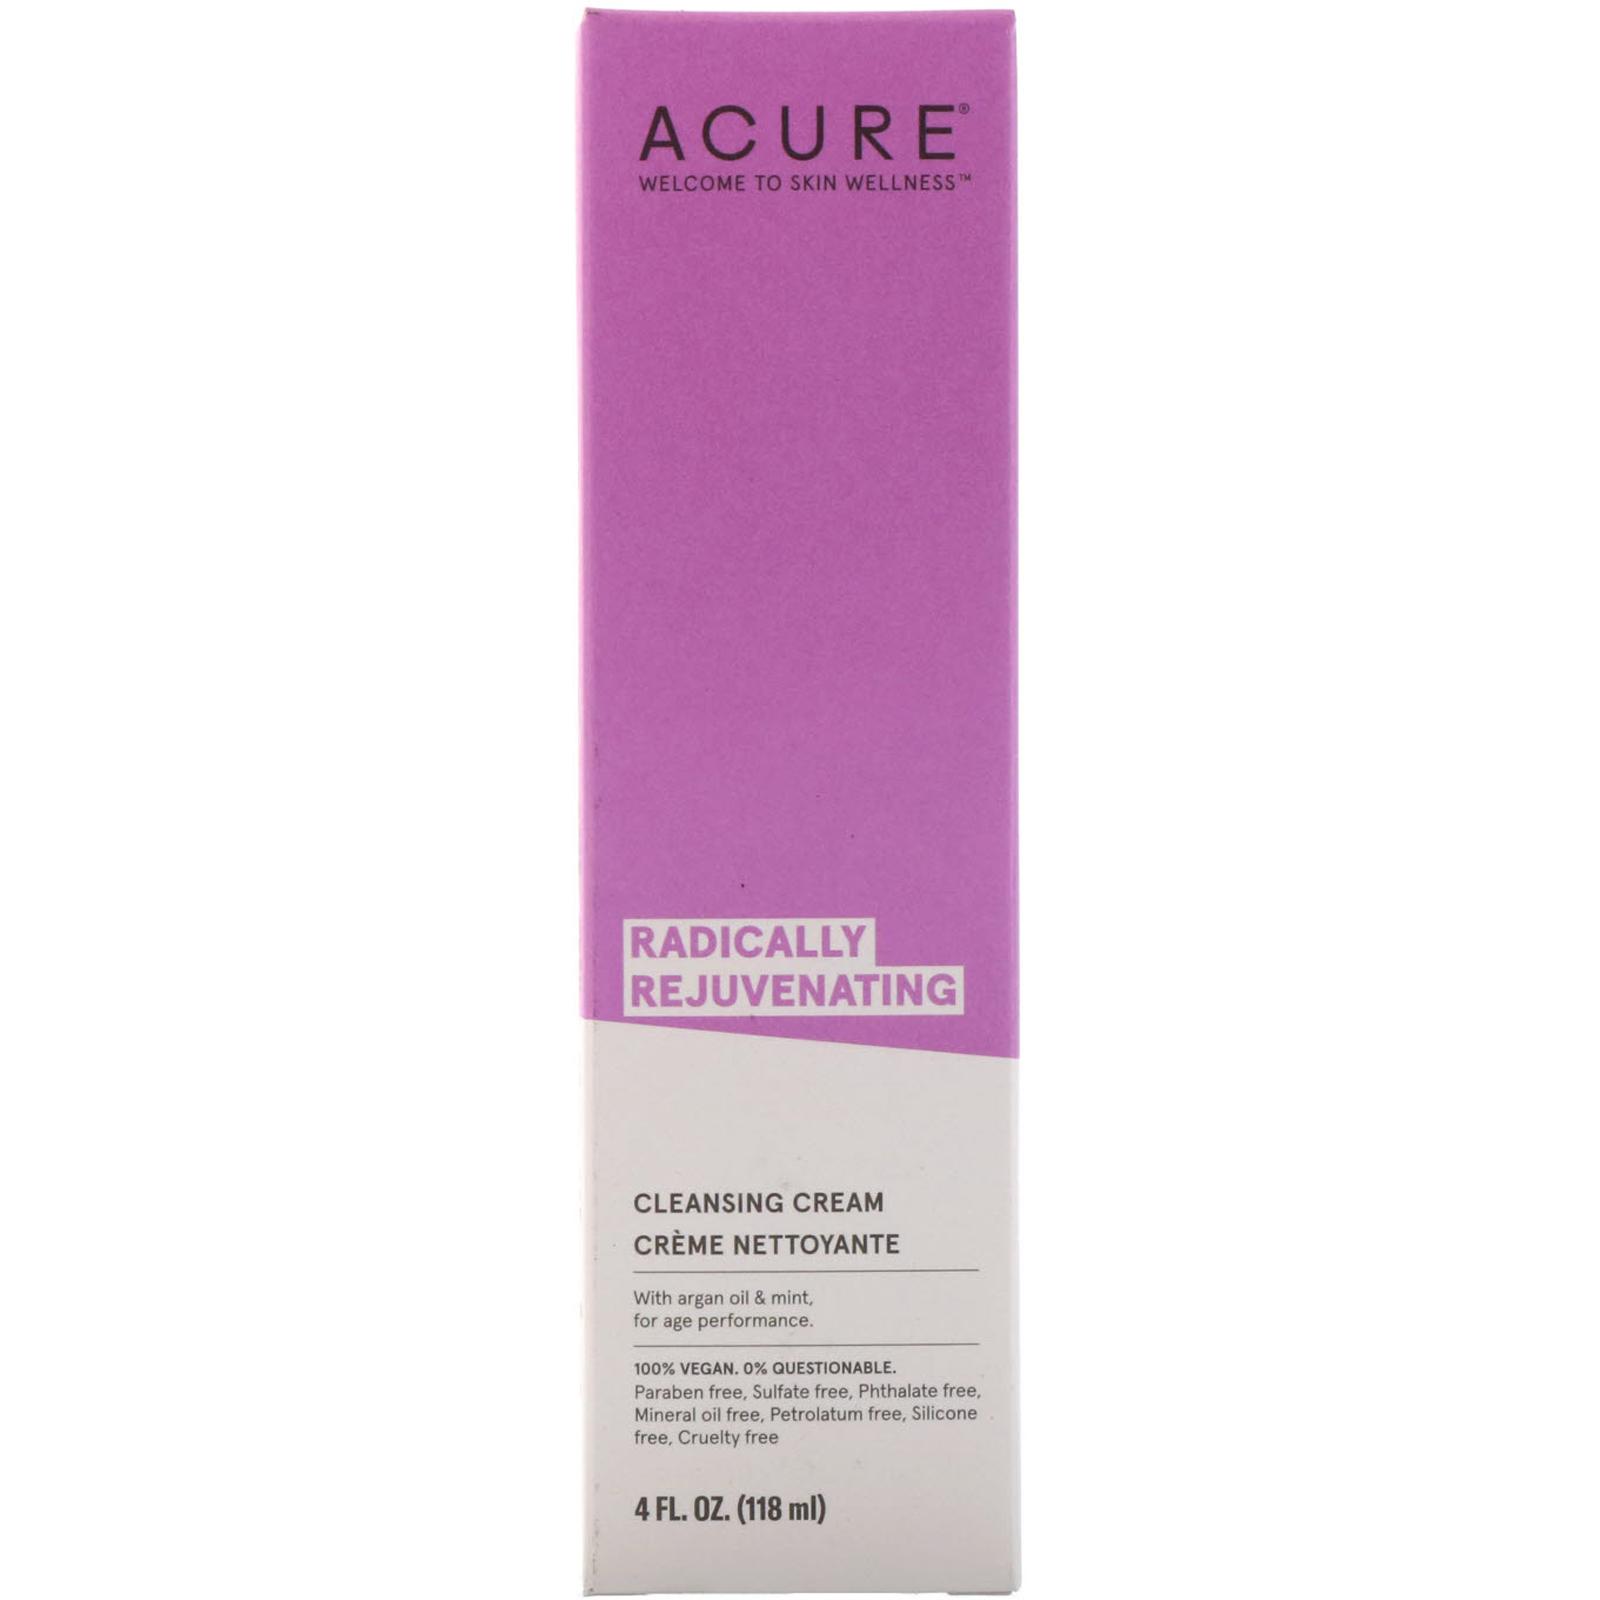 Acure, Radically Rejuvenating, Cleansing Cream, 4 Fl Oz